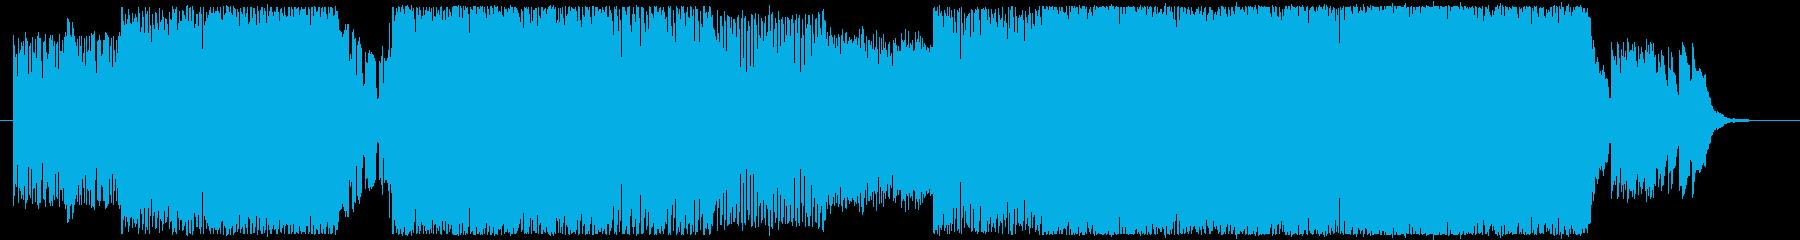 MOON BEAMの再生済みの波形